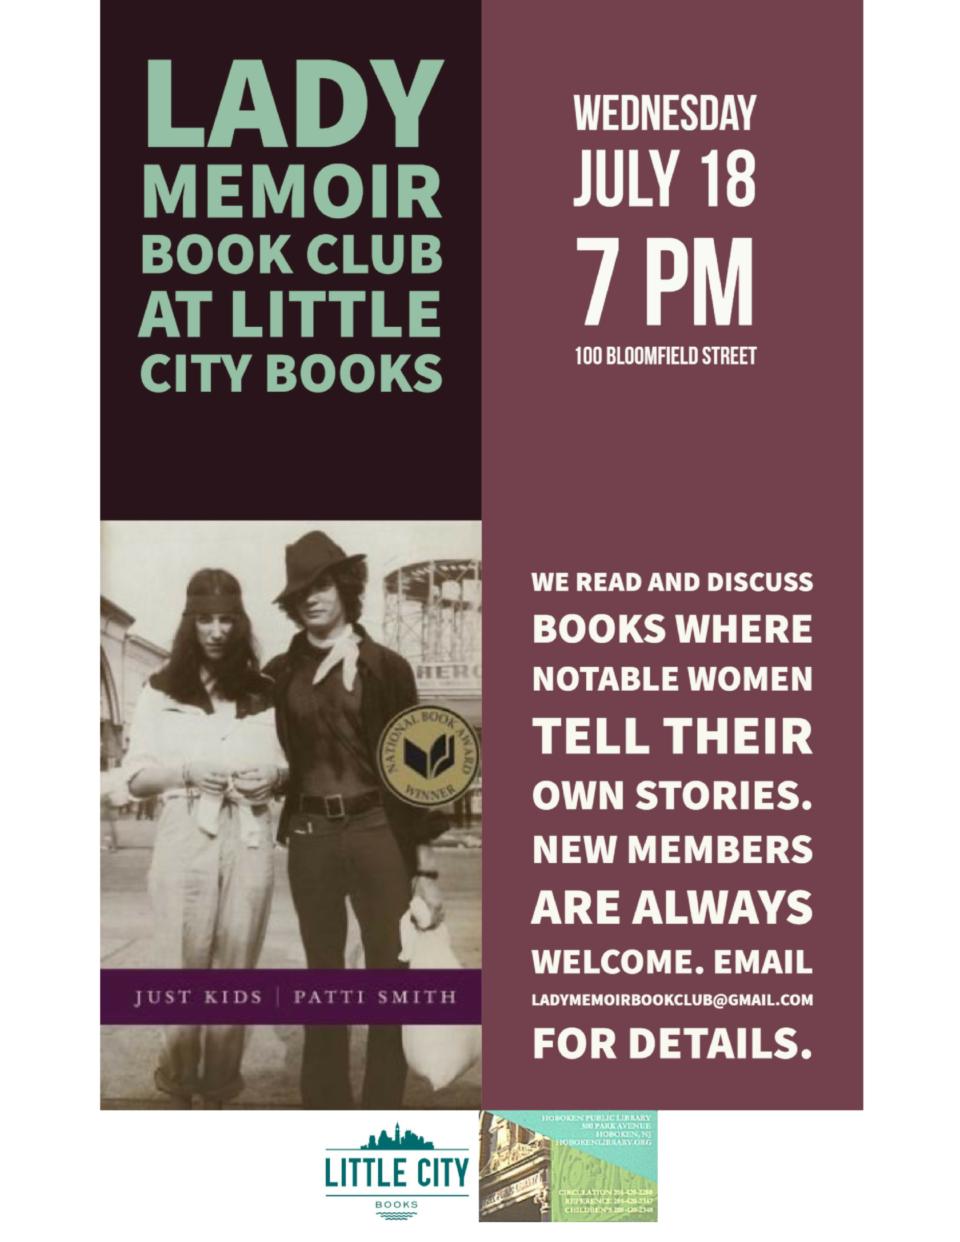 Lady Memoir Book Club Ladies That Rock Summer Series: Just Kids by Patti Smith